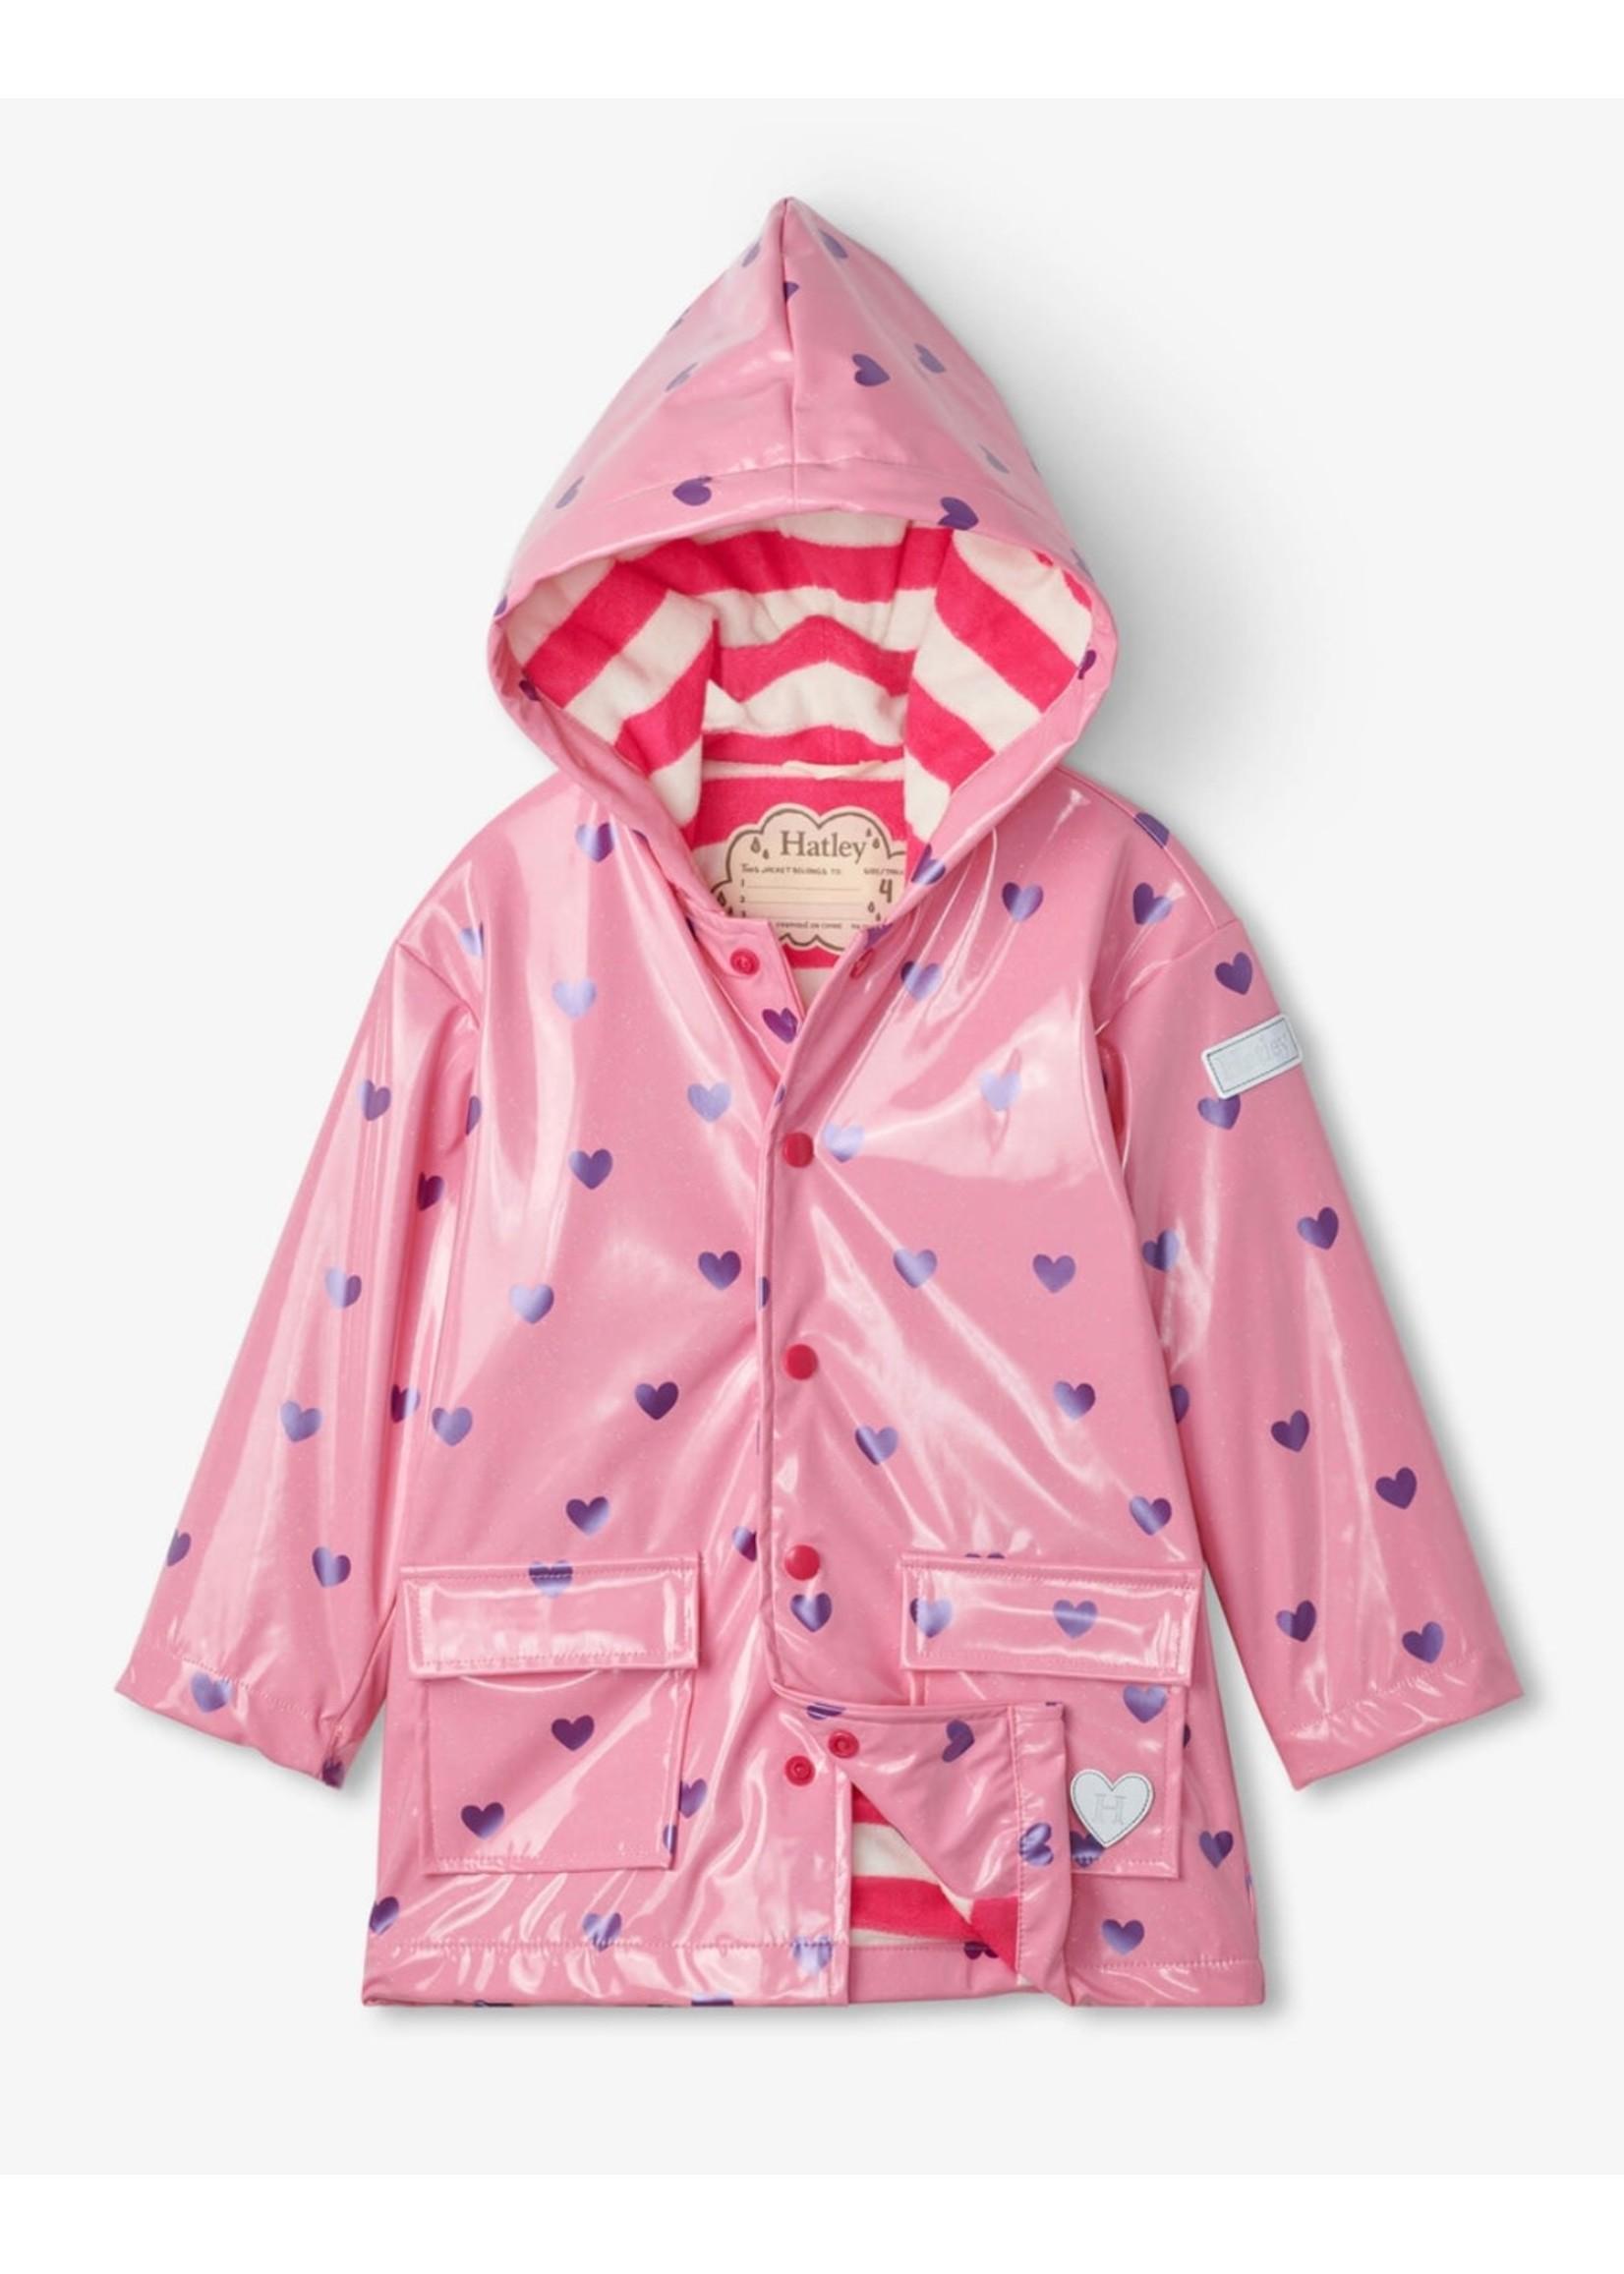 Hatley Scattered Hearts Glitter Raincoat